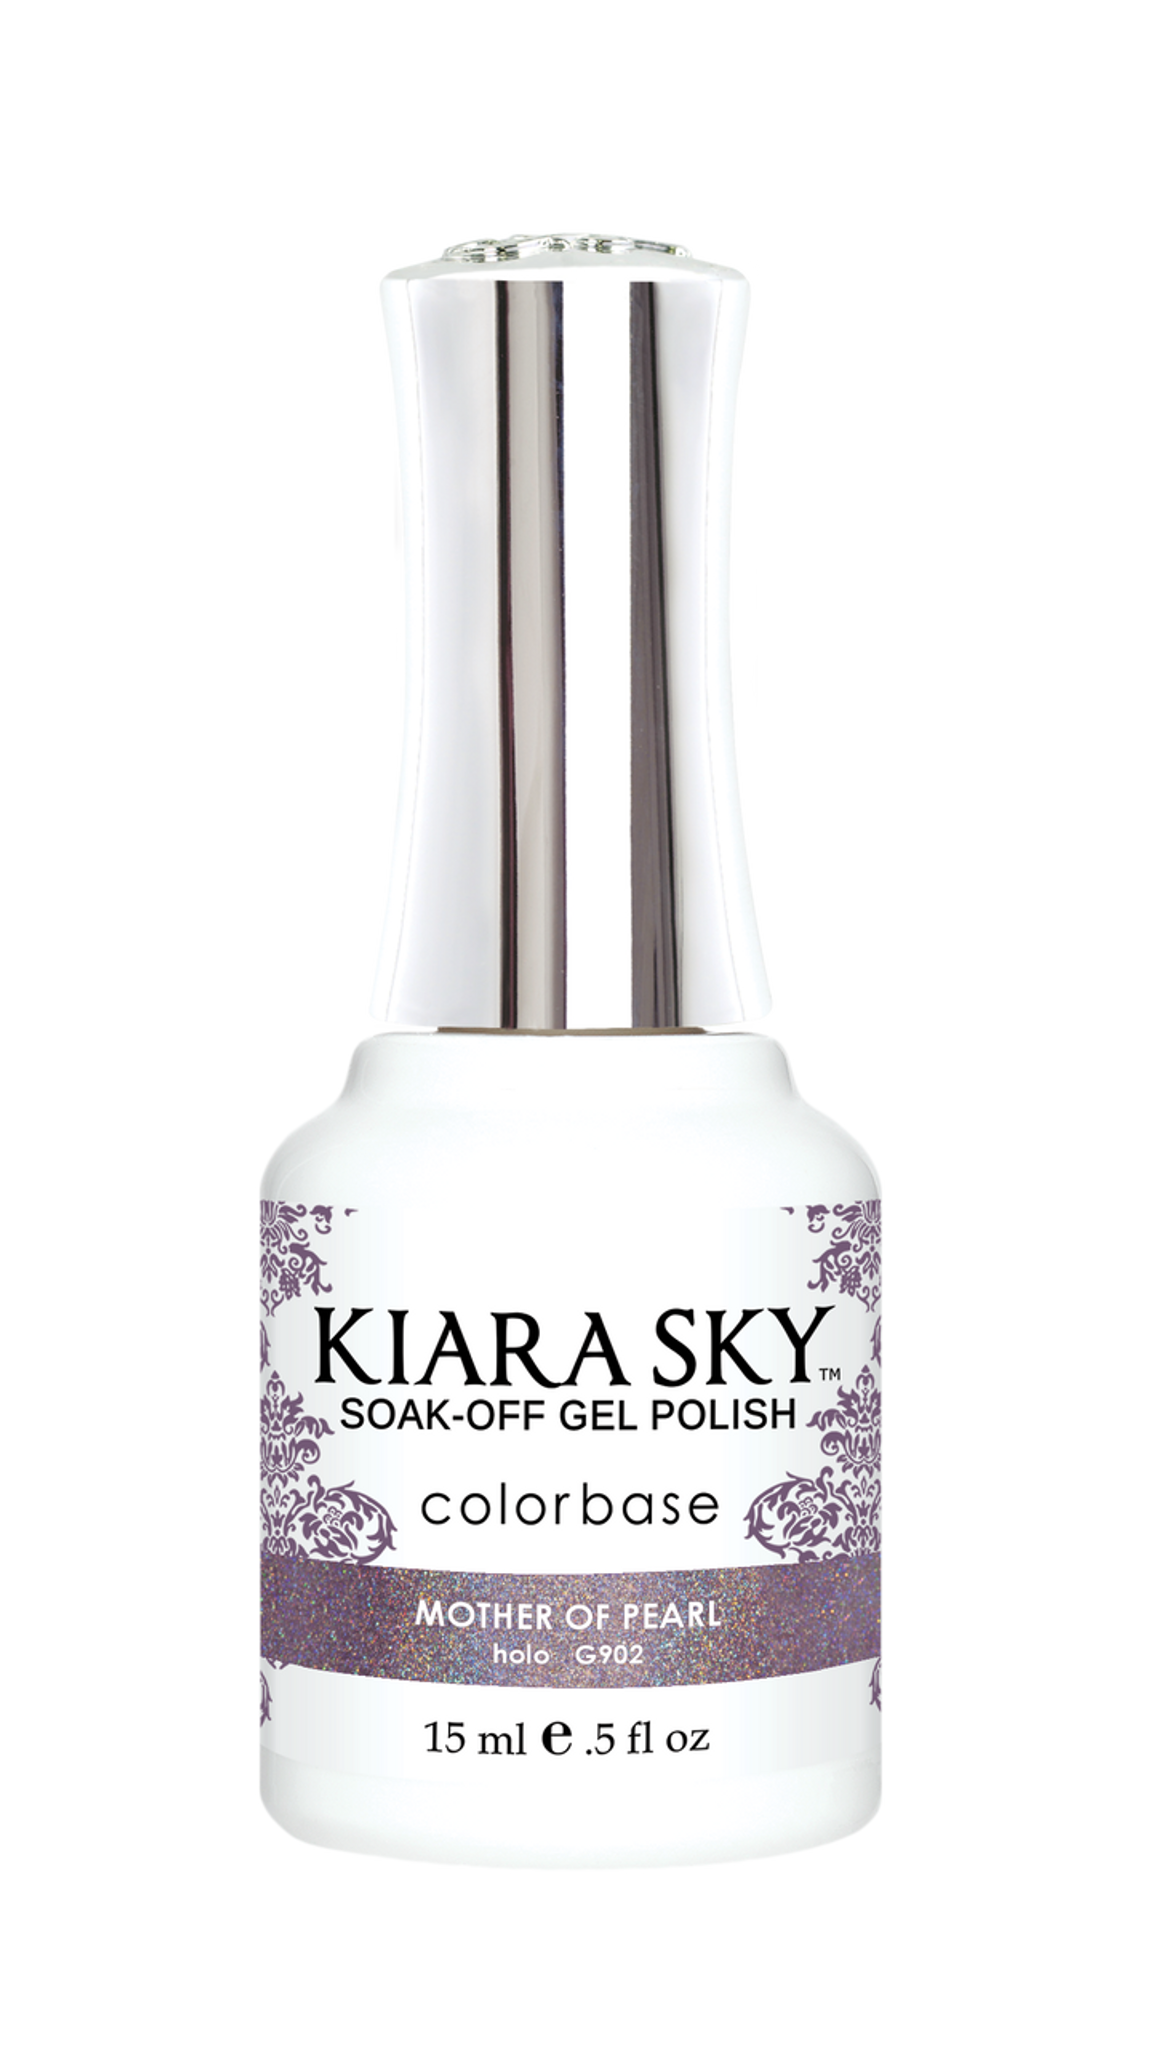 Mermaid Nail Polish | Iridescent Gel Nail Polish | Kiara Sky